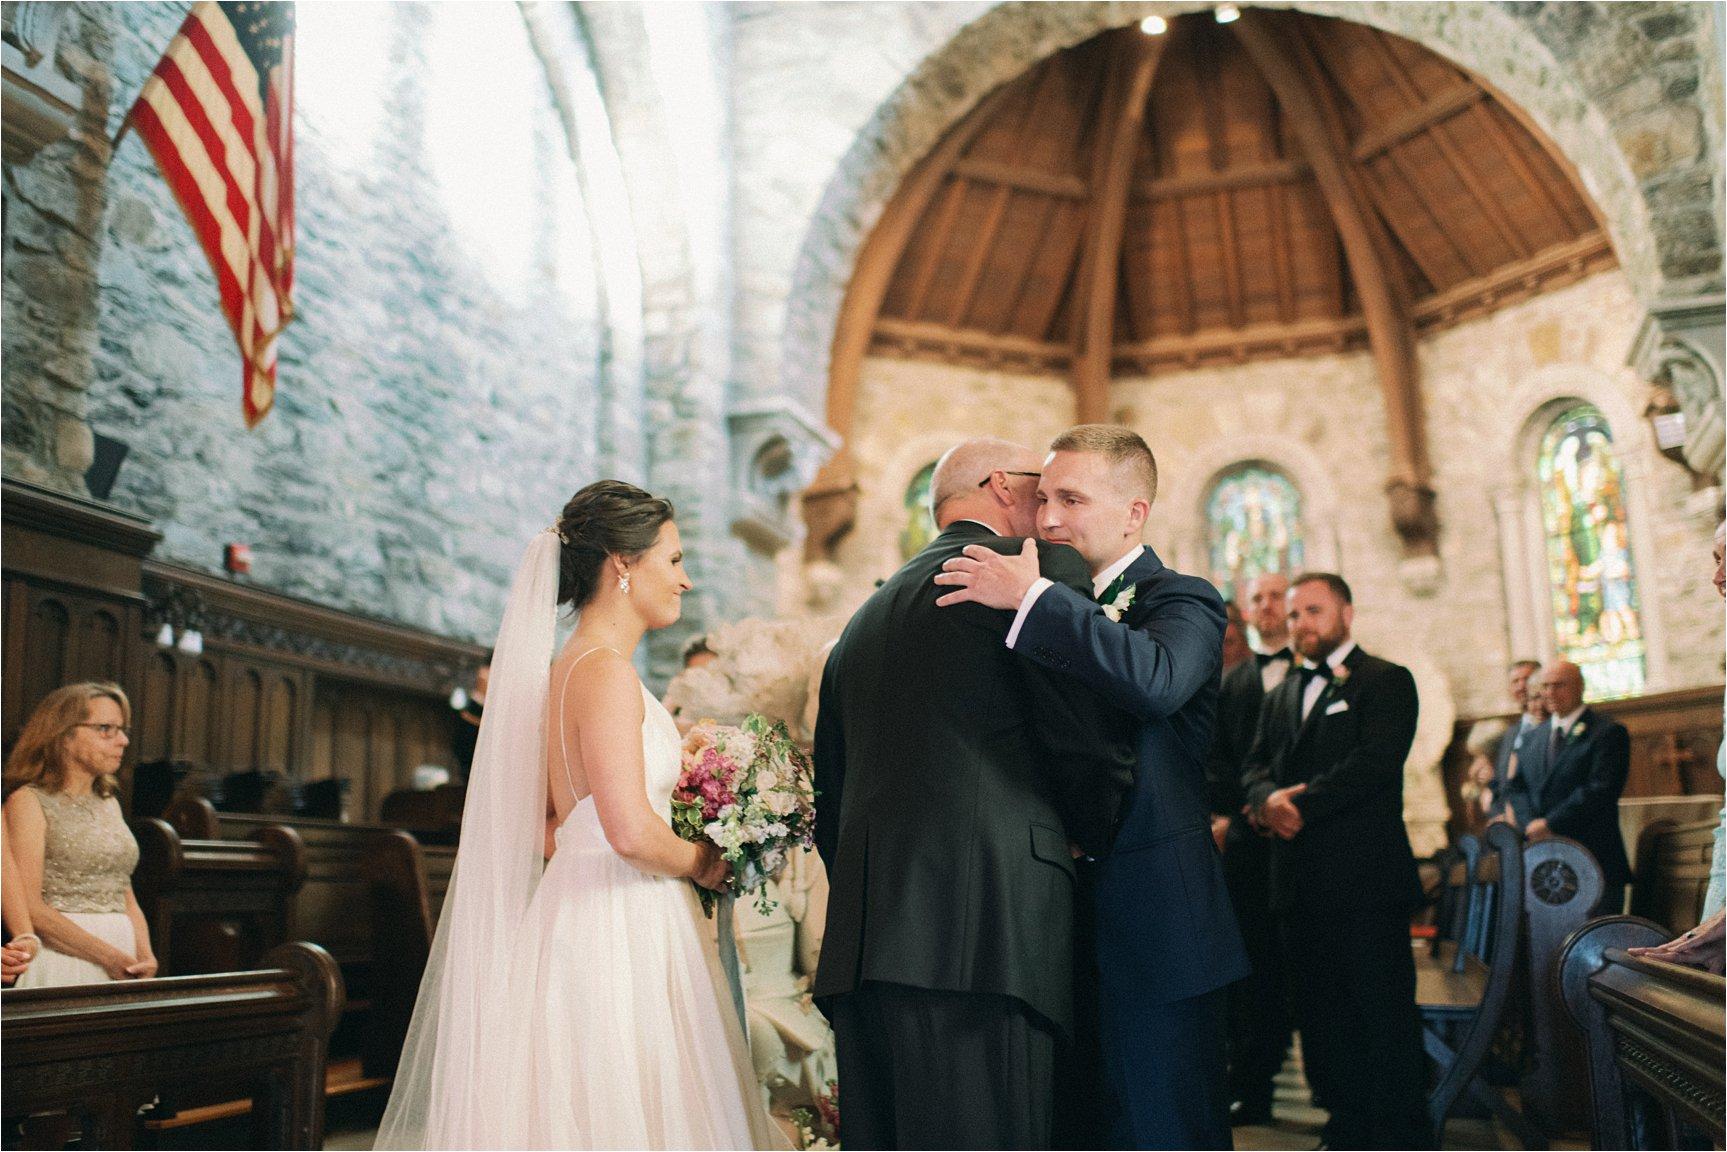 Lord_Thompson_Manor_Wedding073.JPG